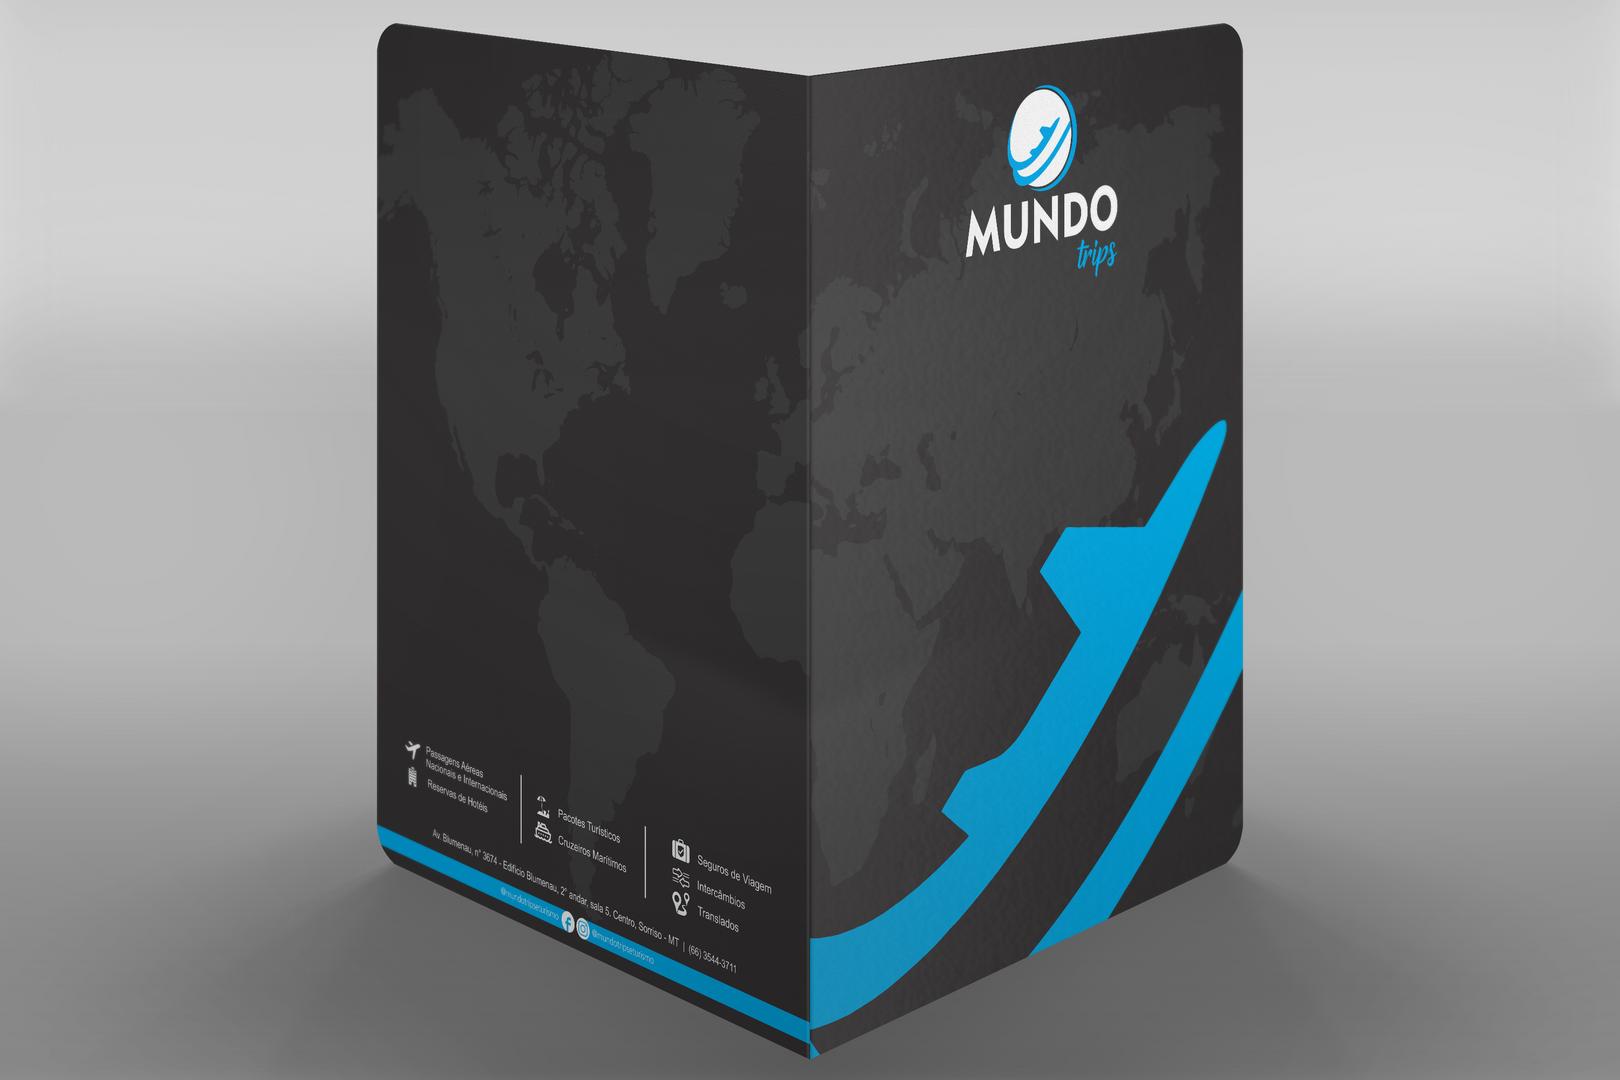 Mundo.png